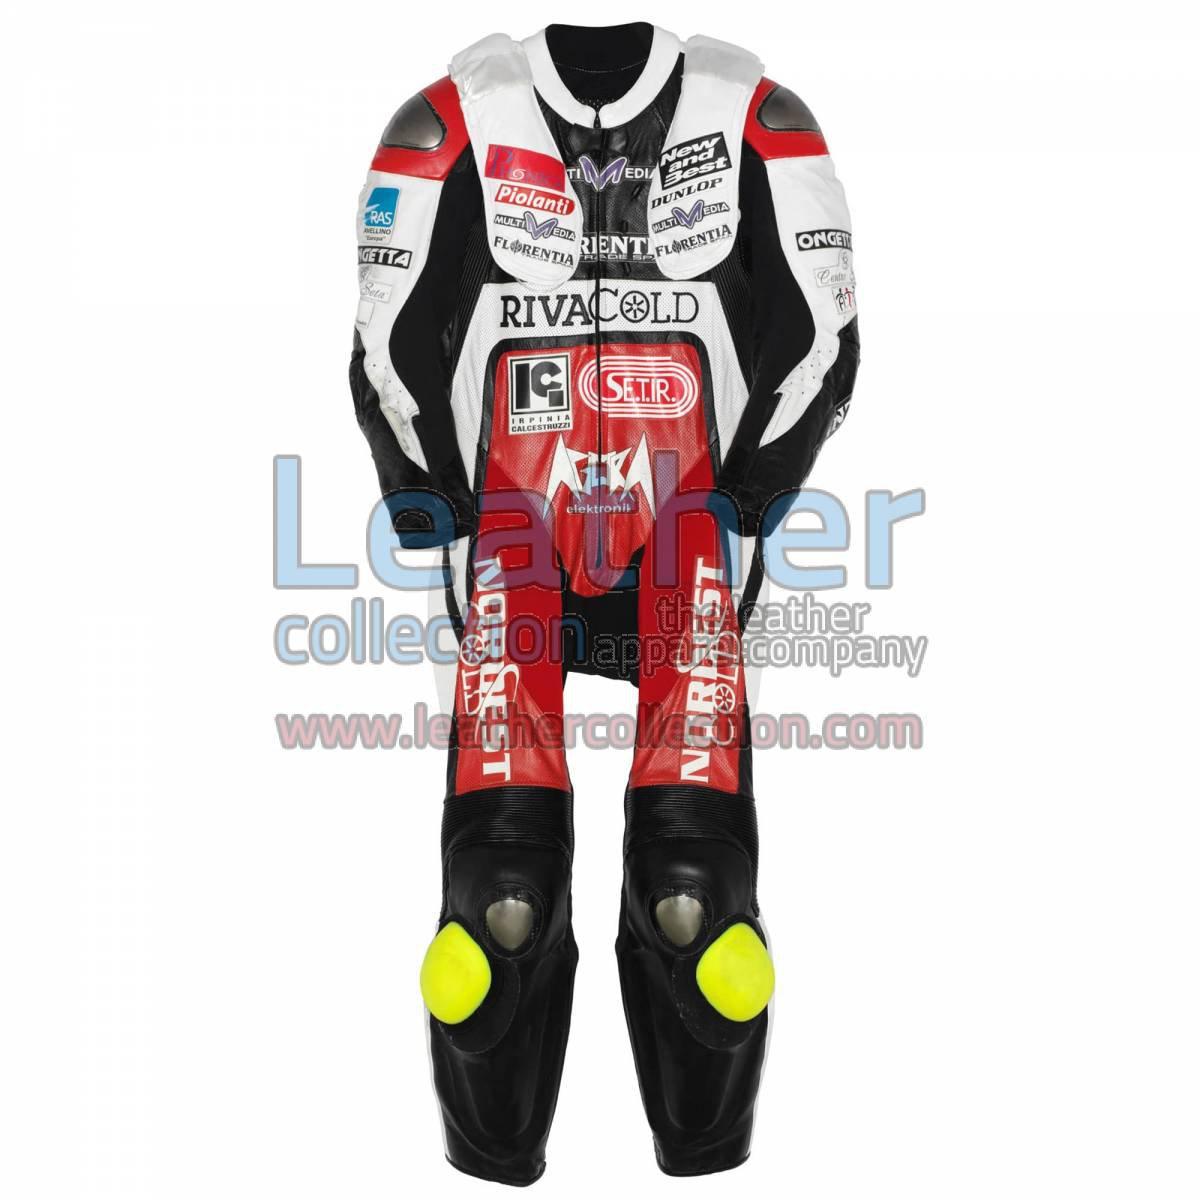 Simone Grotzkyj Giorgi Aprilia GP 2007 Leathers